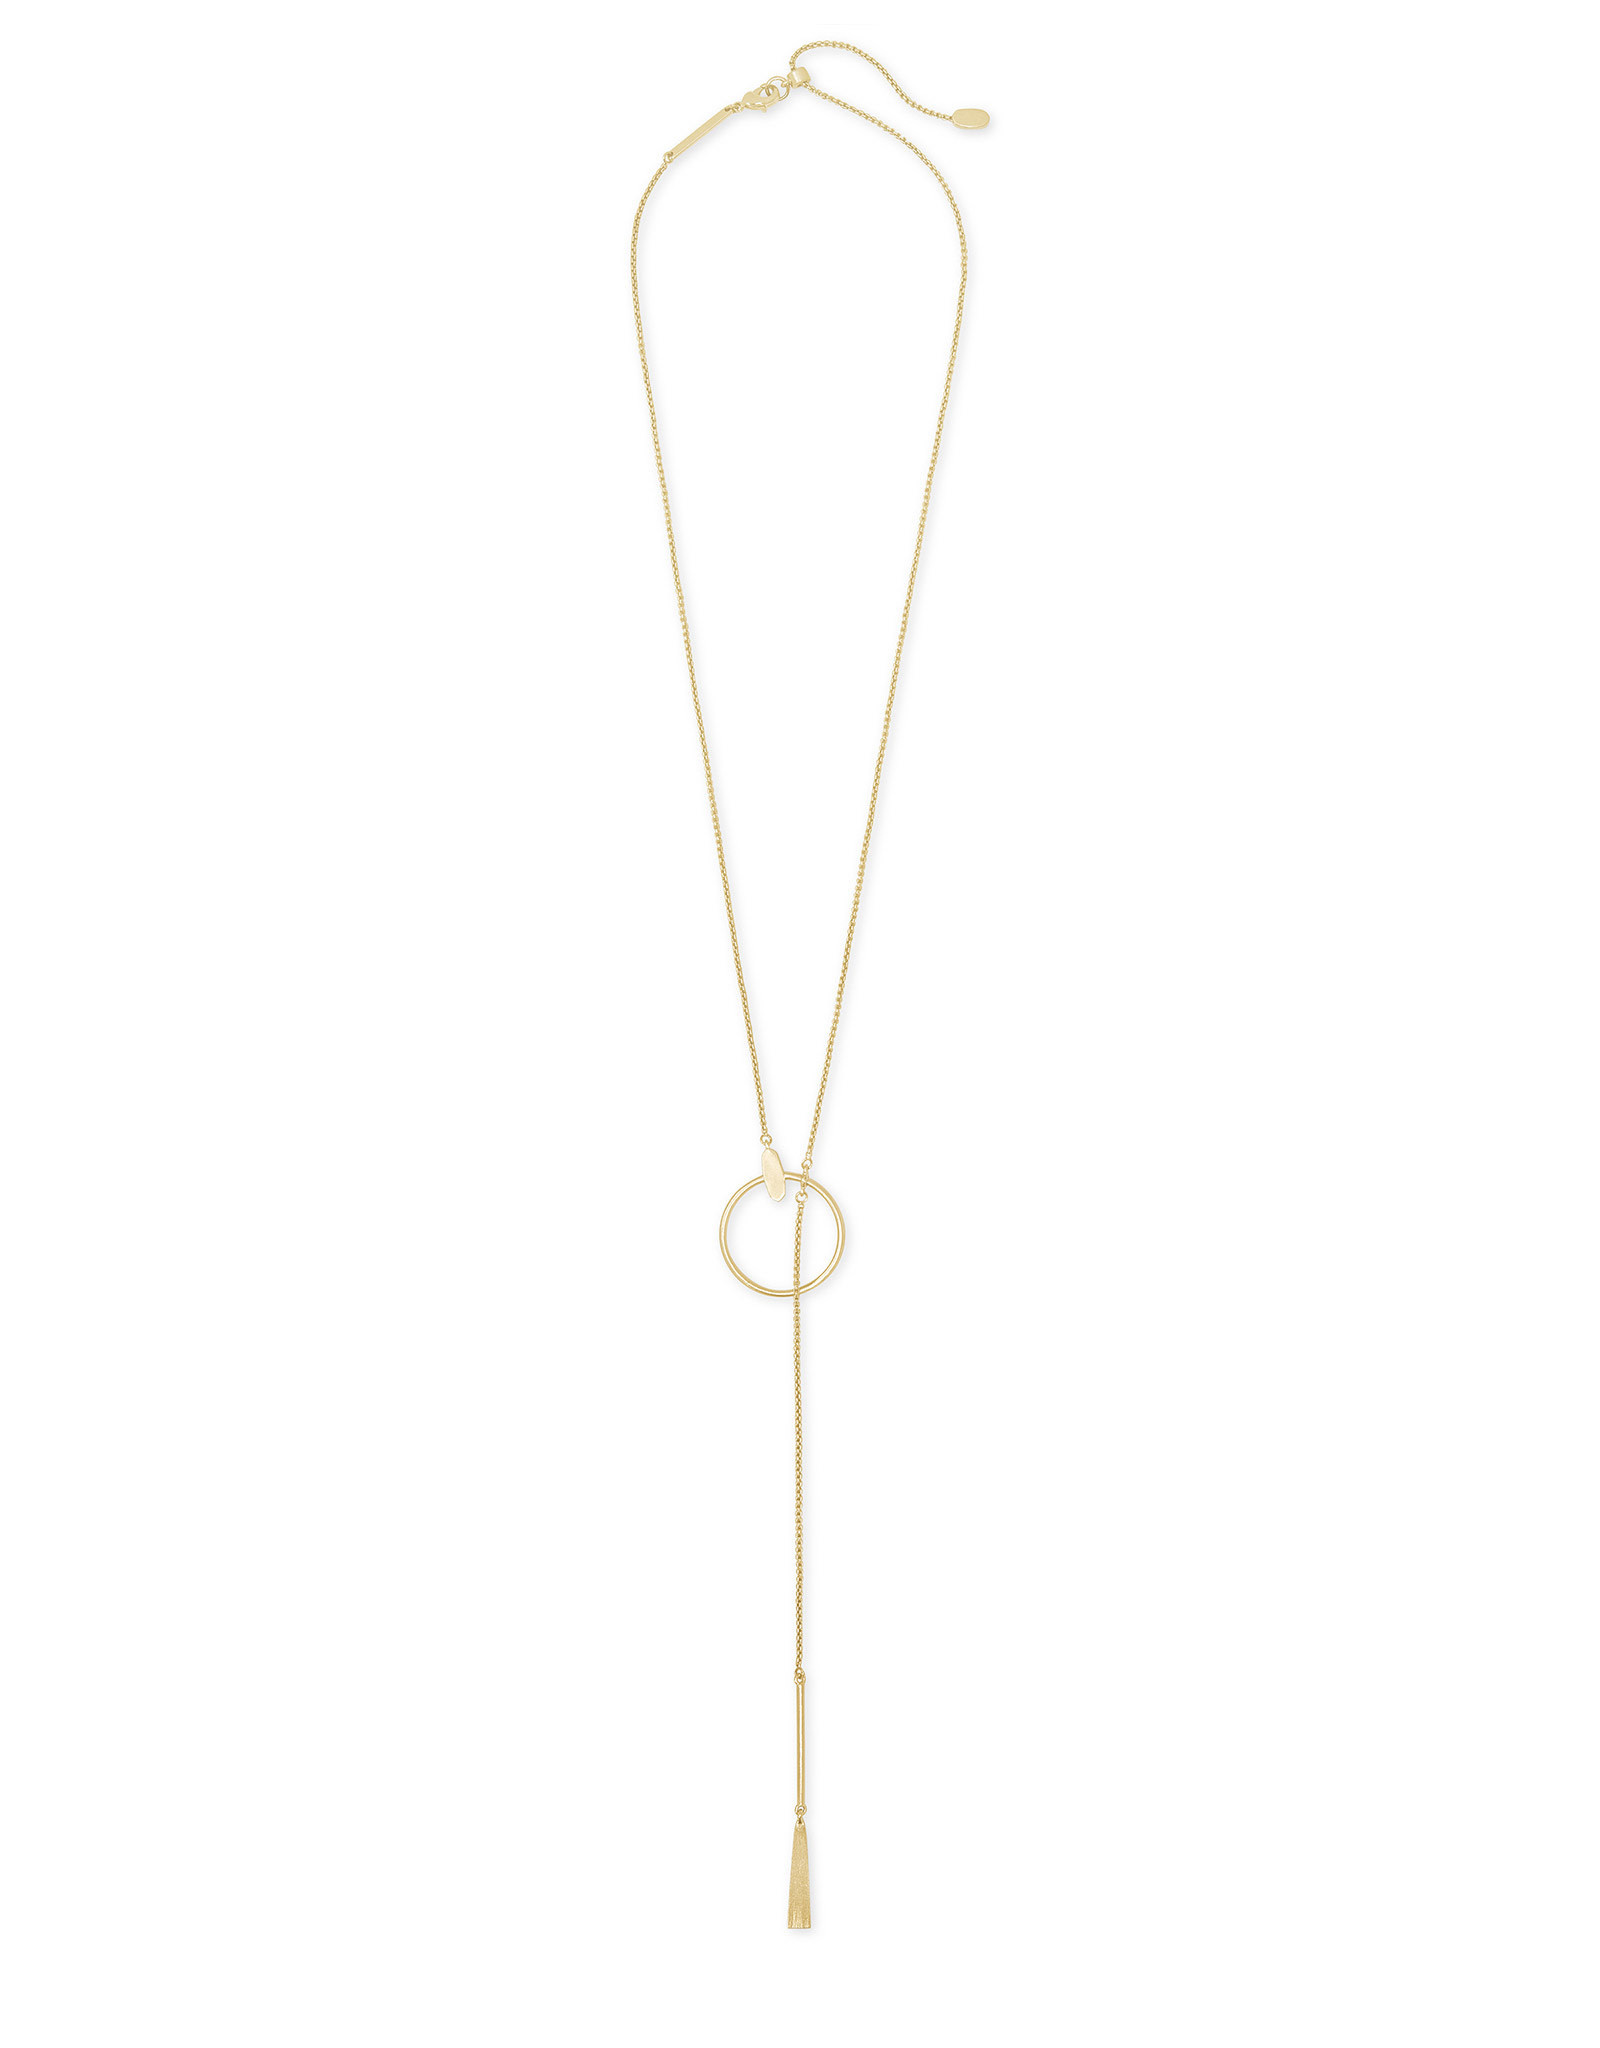 Kendra Scott Small Tegan Necklace